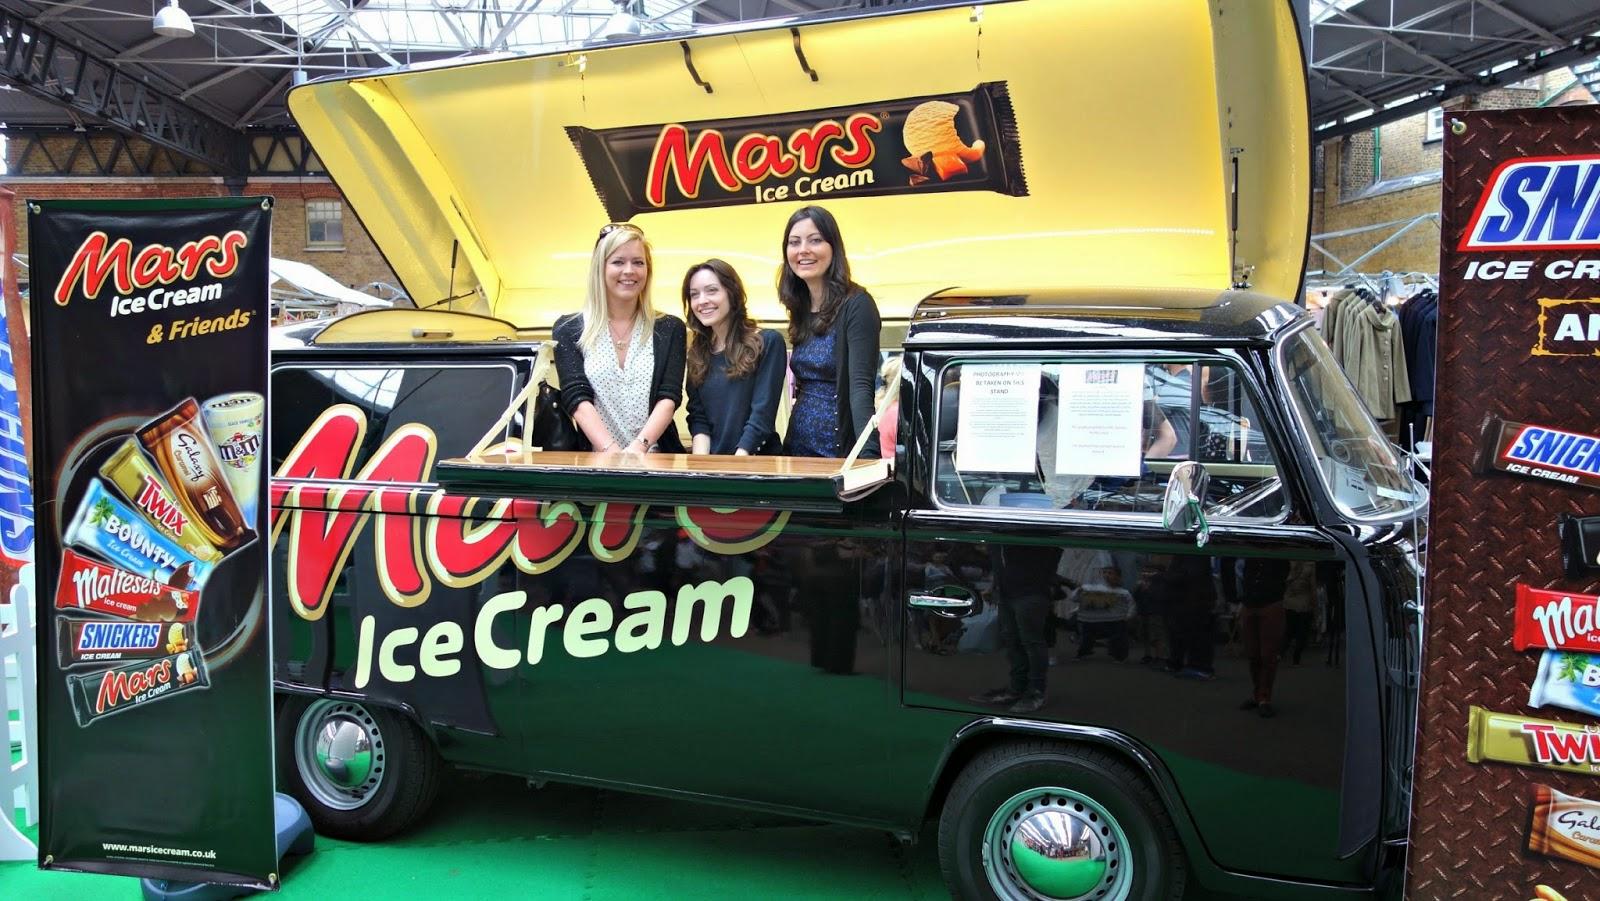 Mars Free Ice Cream Spitalfields London